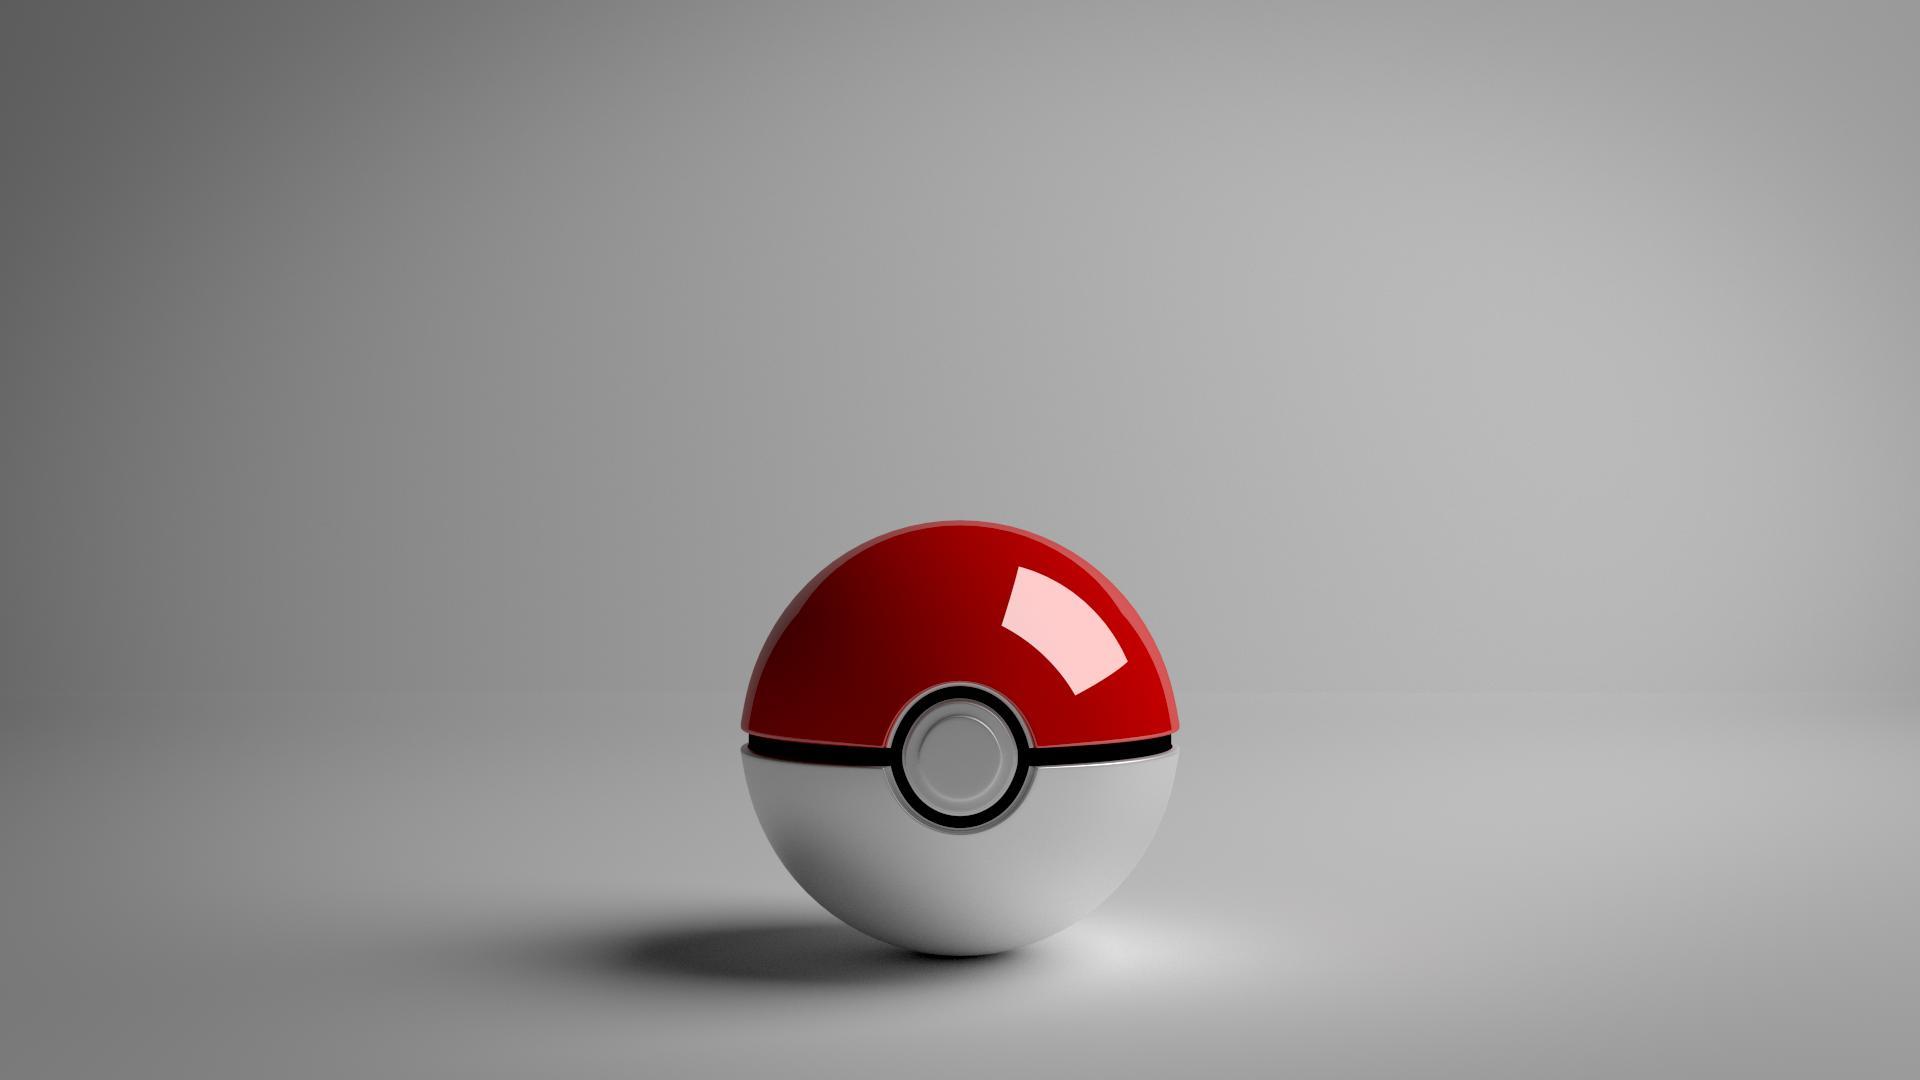 Poke Ball Premium